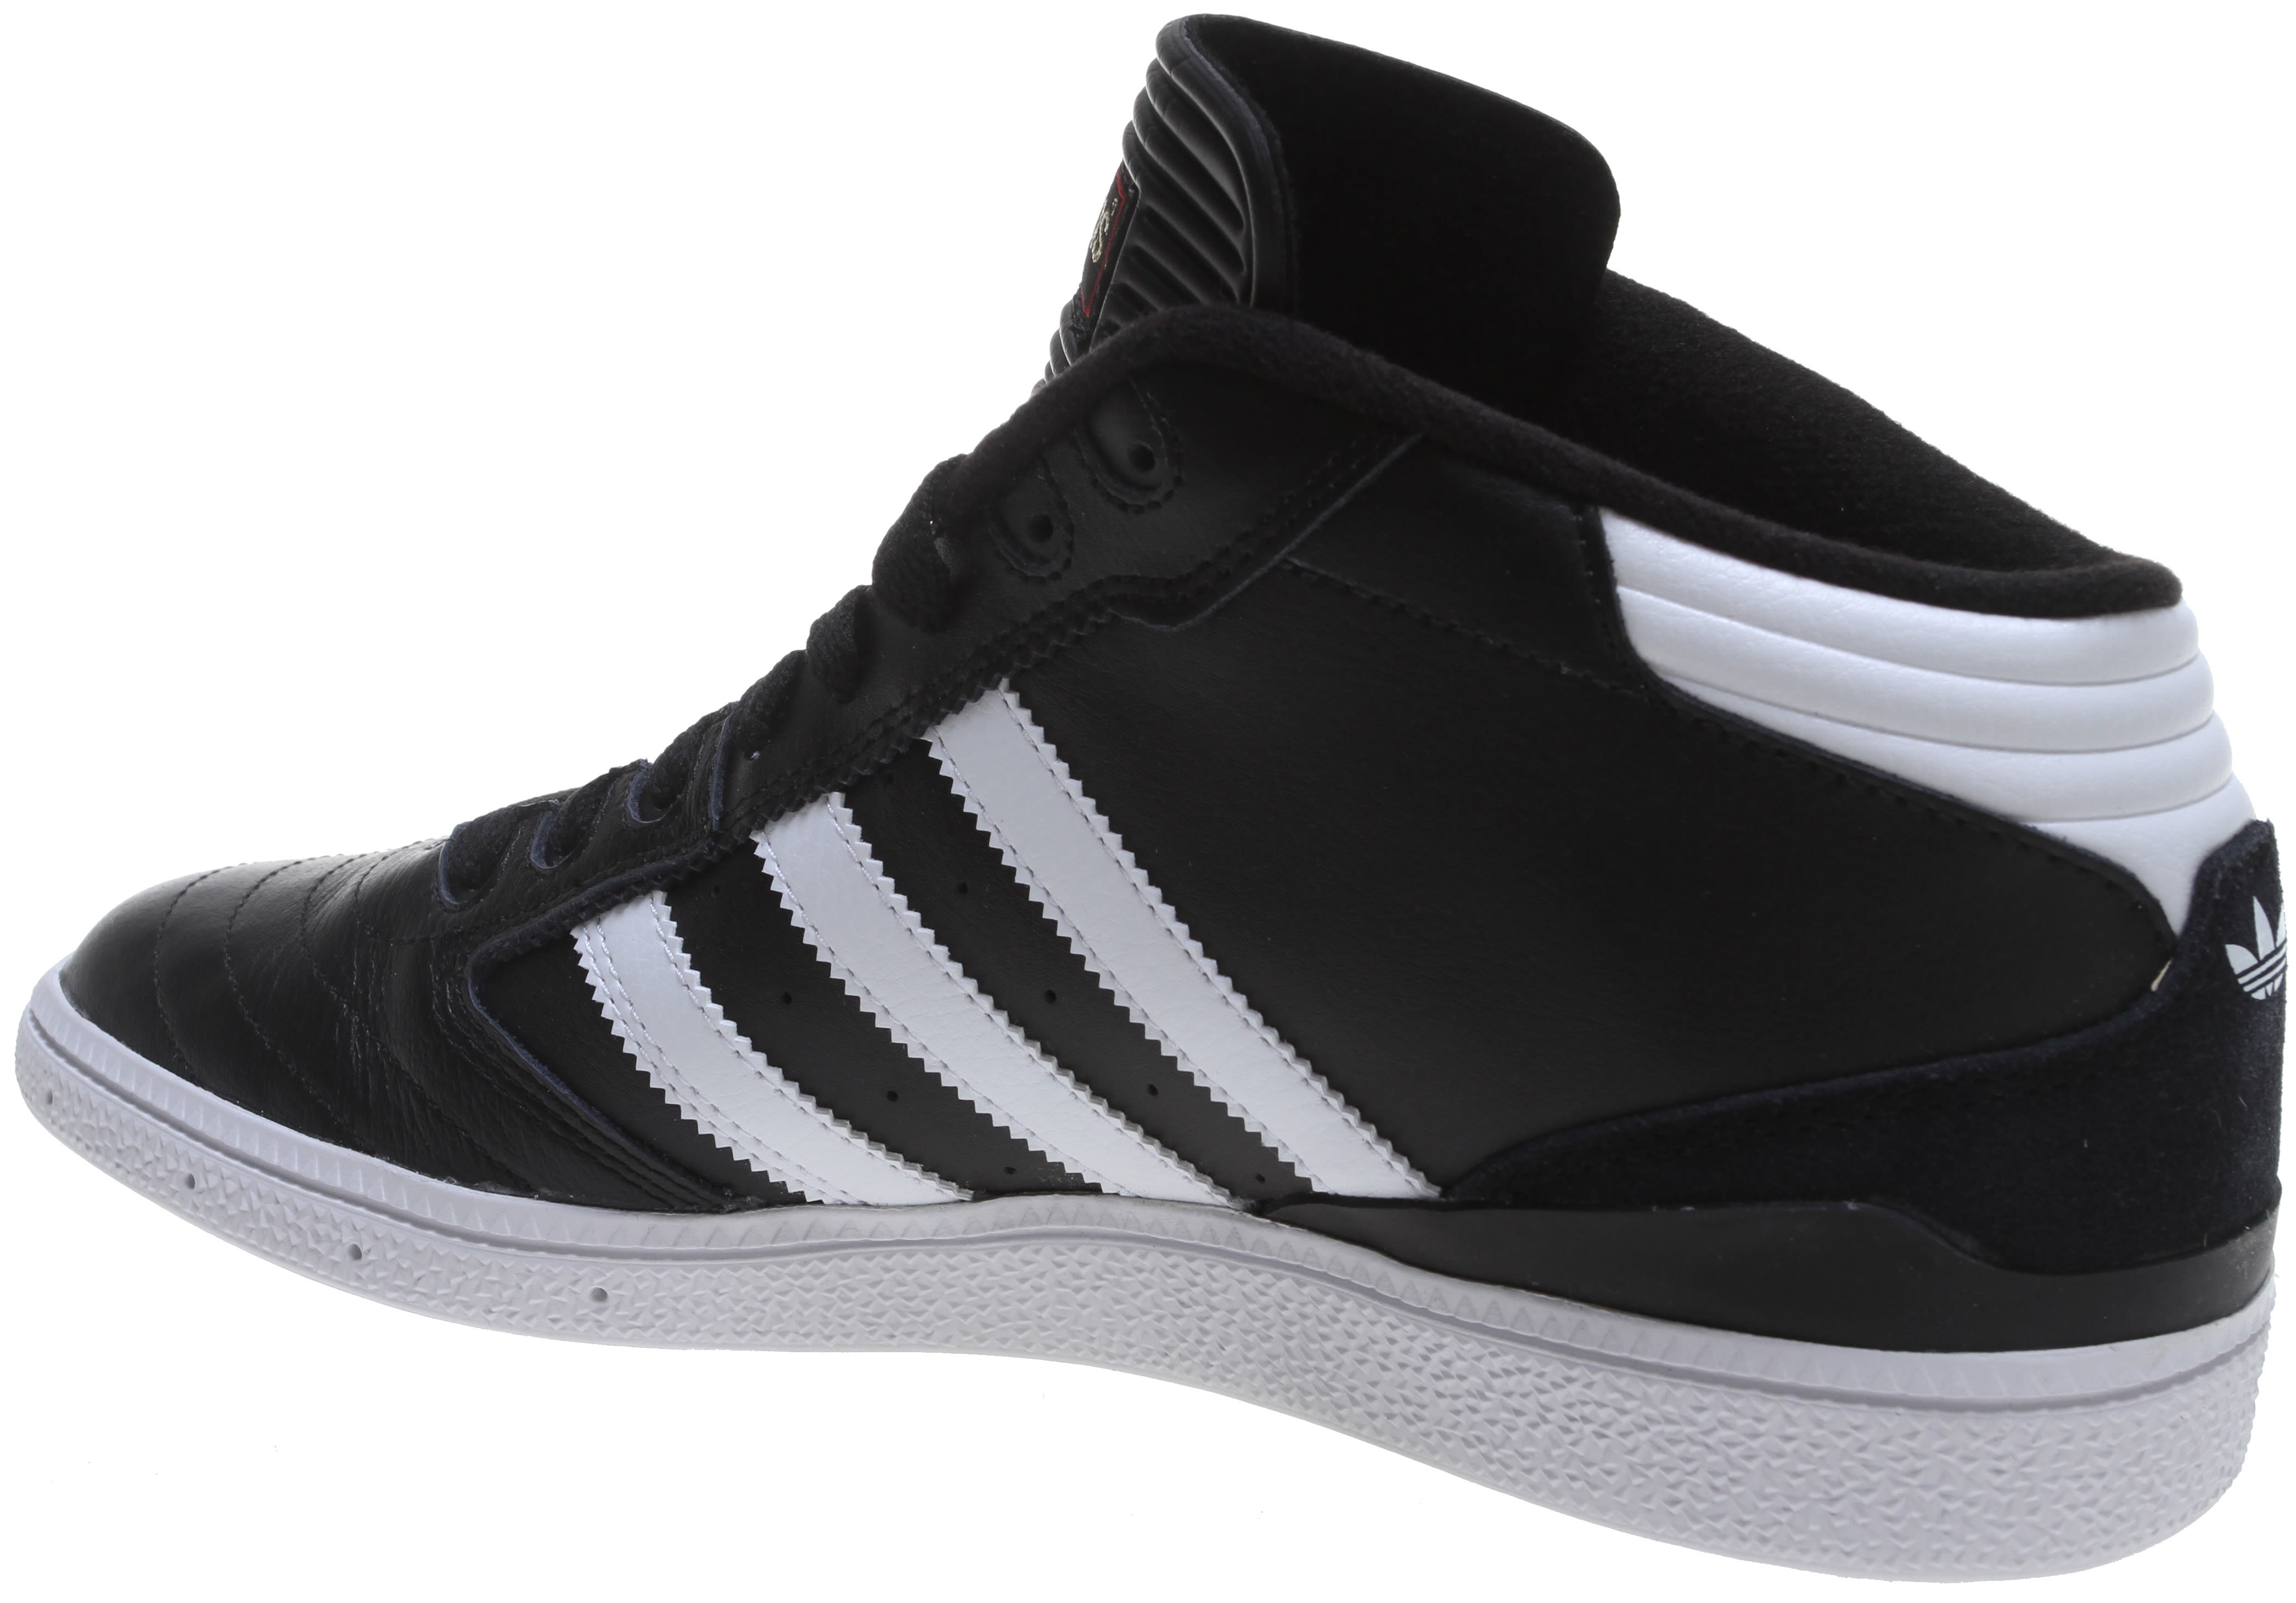 Adidas Busenitz Pro Mid Skate Shoes - thumbnail 3 c43ee7b788cd